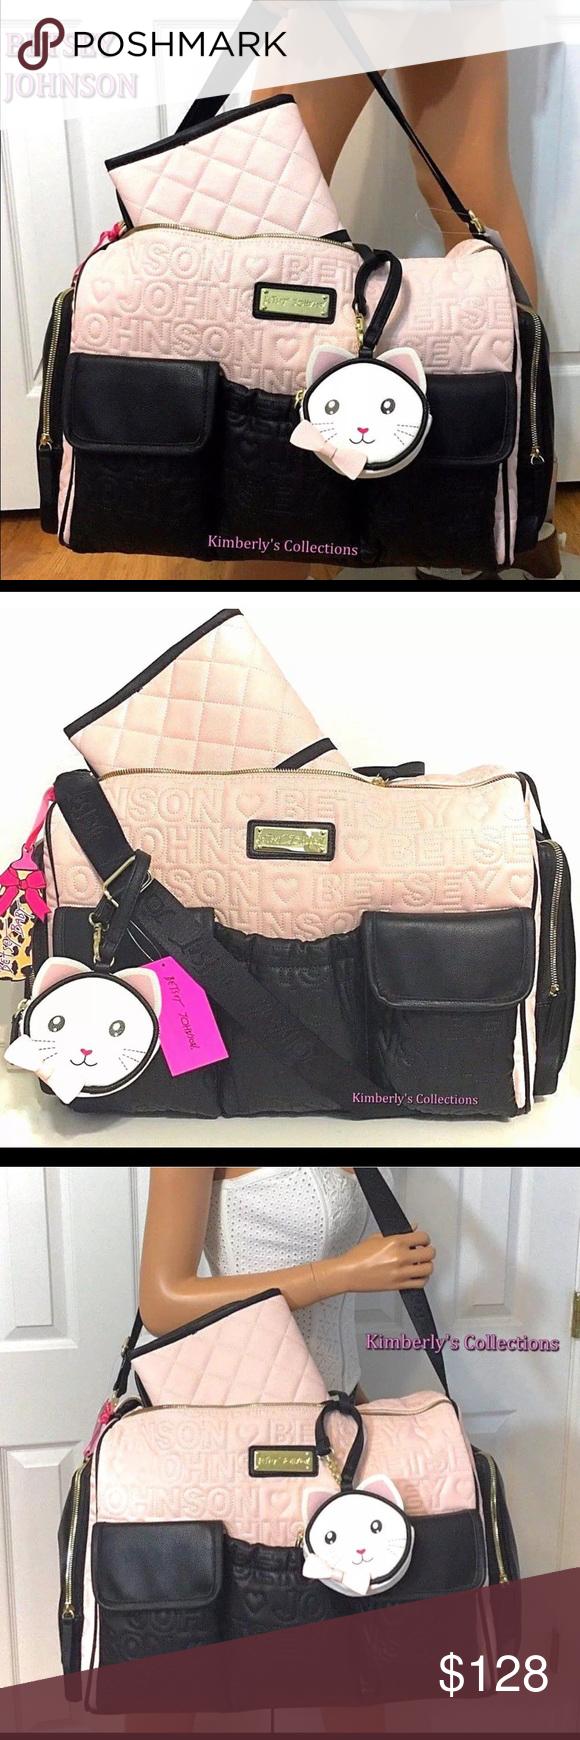 5feaa85d1e11 BETSEY JOHNSON Diaper Bag Duffel Weekender Tote Betsey Johnson Baby Diaper  Bag Duffel Weekender Travel Tote